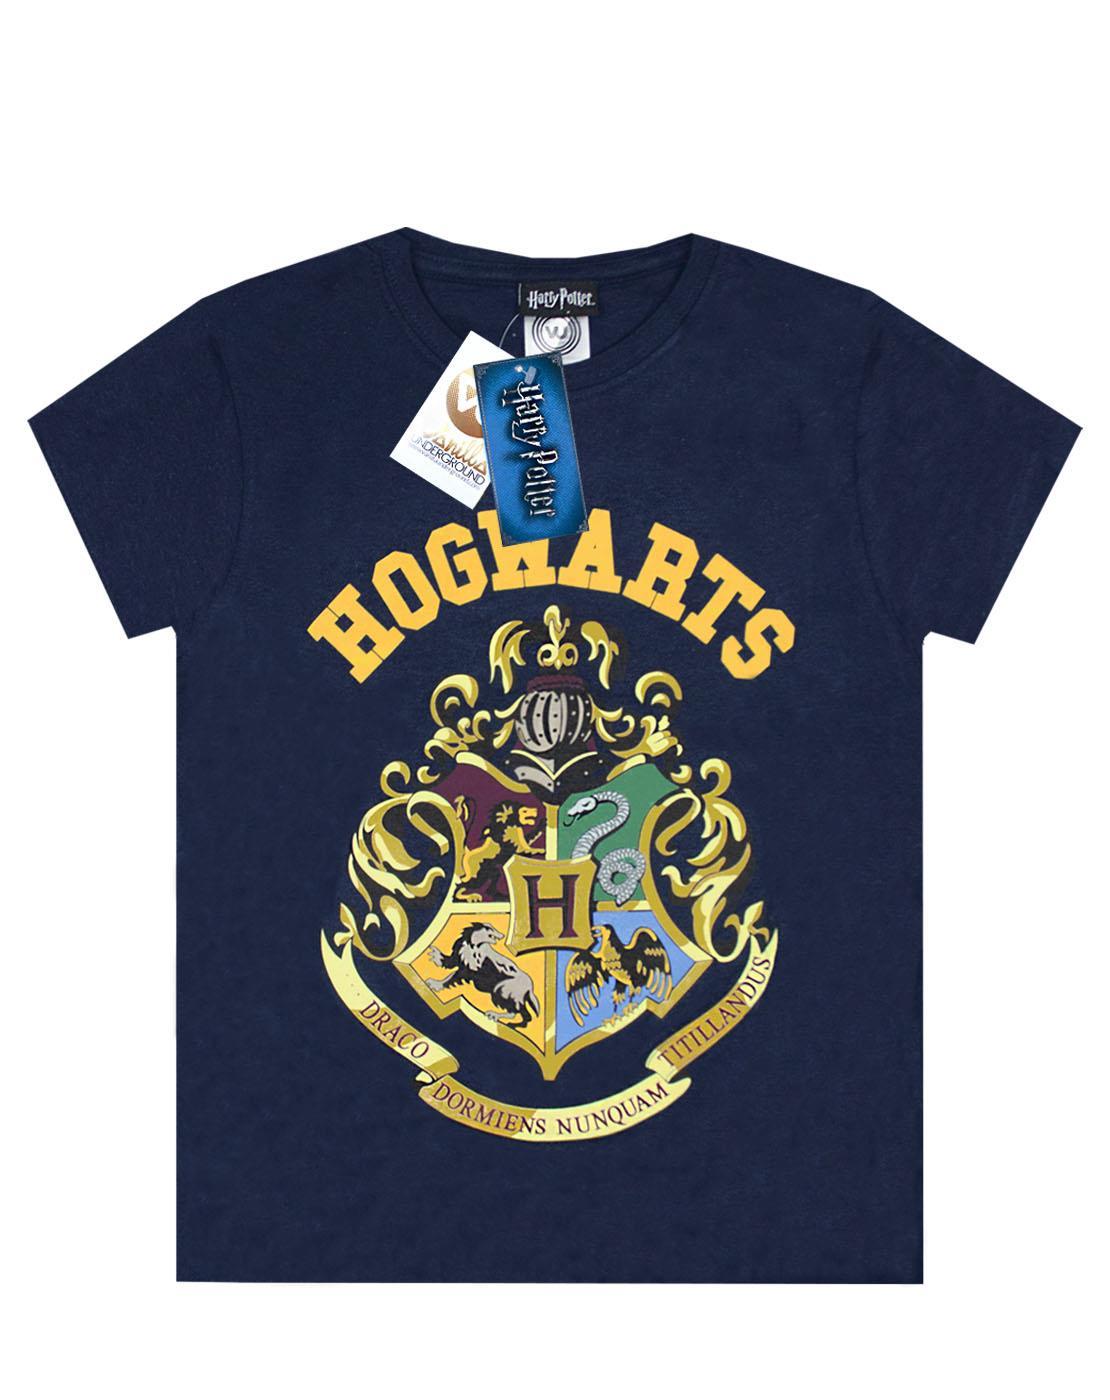 Harry-Potter-Hogwarts-Crest-Boy-039-s-Short-Sleeve-T-Shirt-in-Navy thumbnail 7